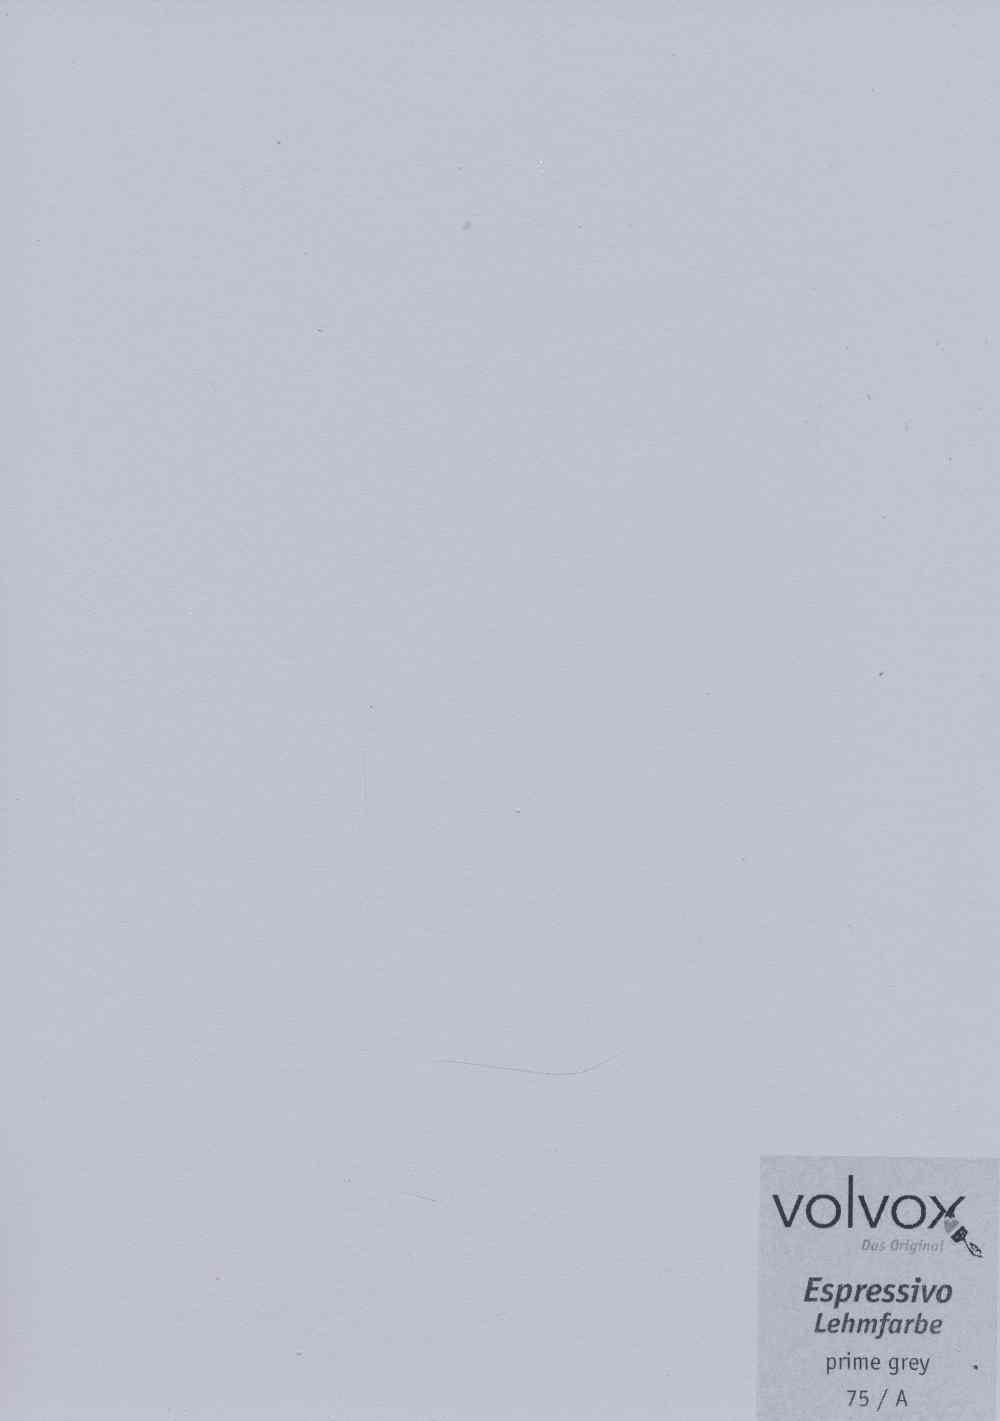 Volvox Espressivo Lehmfarbe 075 prime grey